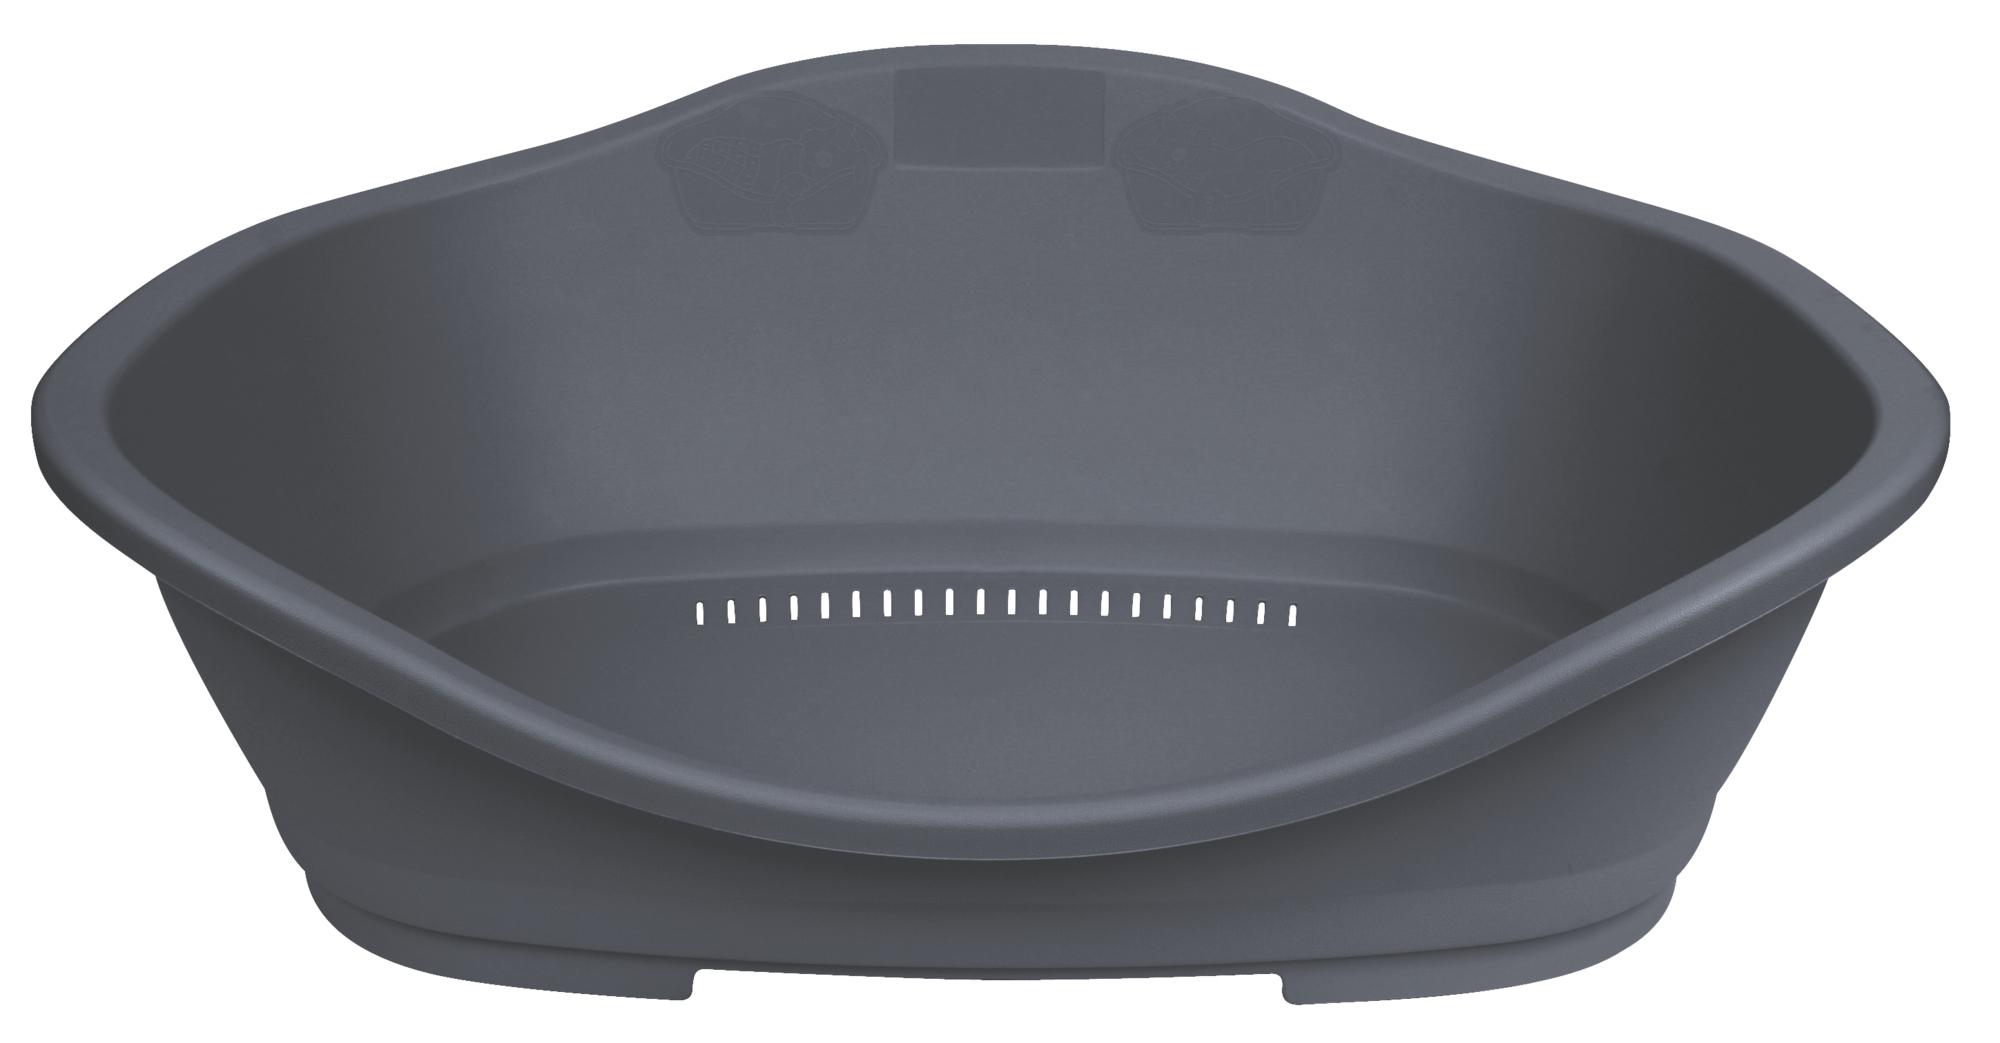 TRIXIE Kunststoffbett Sleeper TRIXIE Bett Sleeper, Kunststoff, Gr. 2: 68 × 47 cm, dunkelgrau